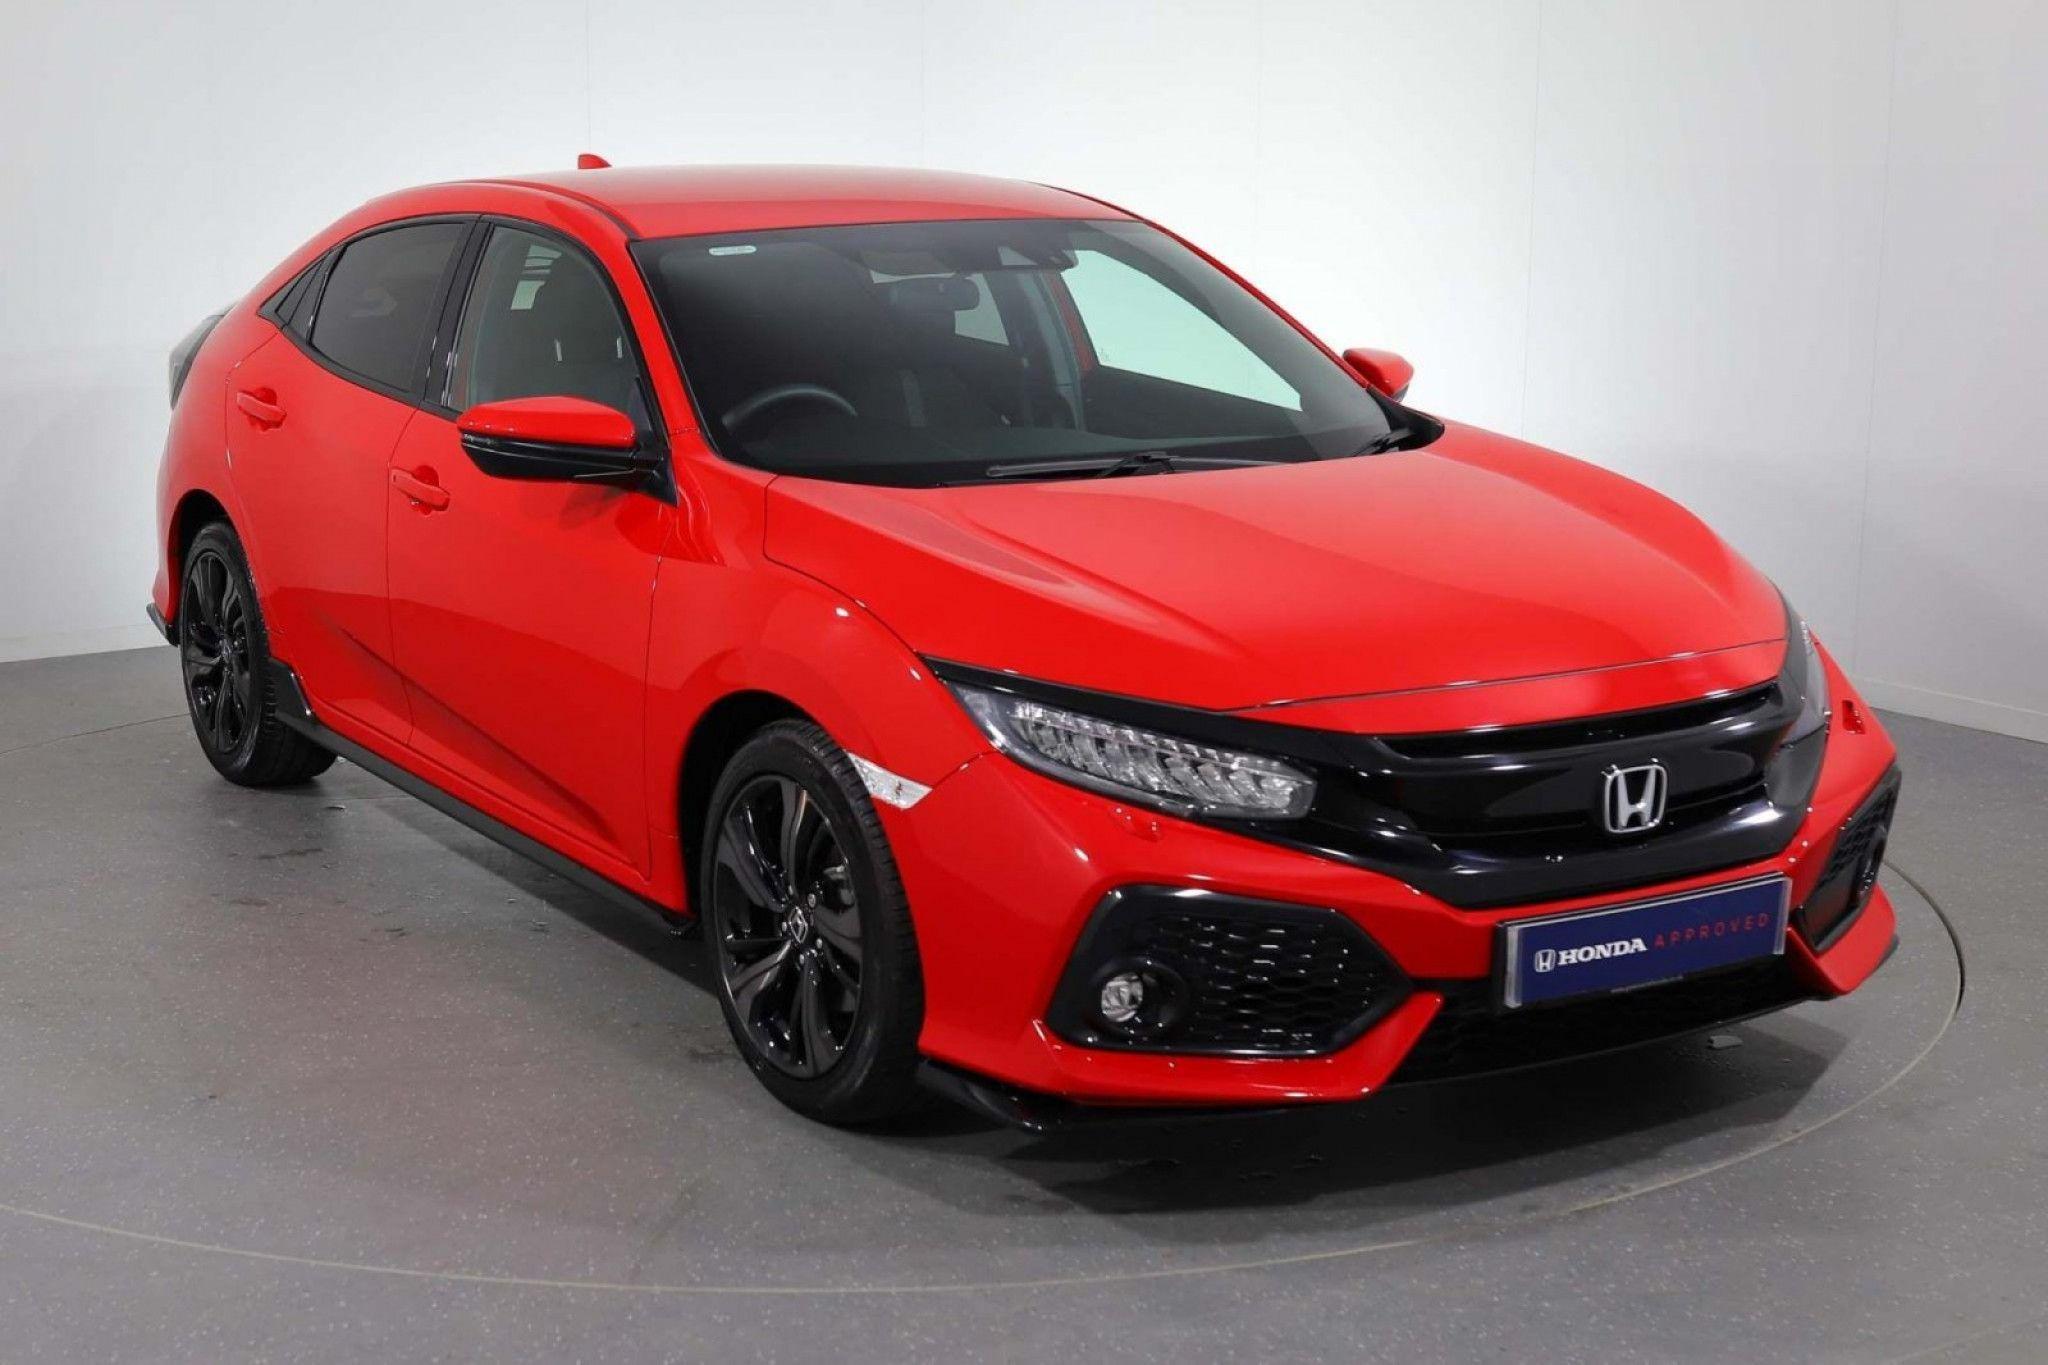 Honda Civic 1.5 Vtec Turbo Sport 5Dr in 2020 Honda civic